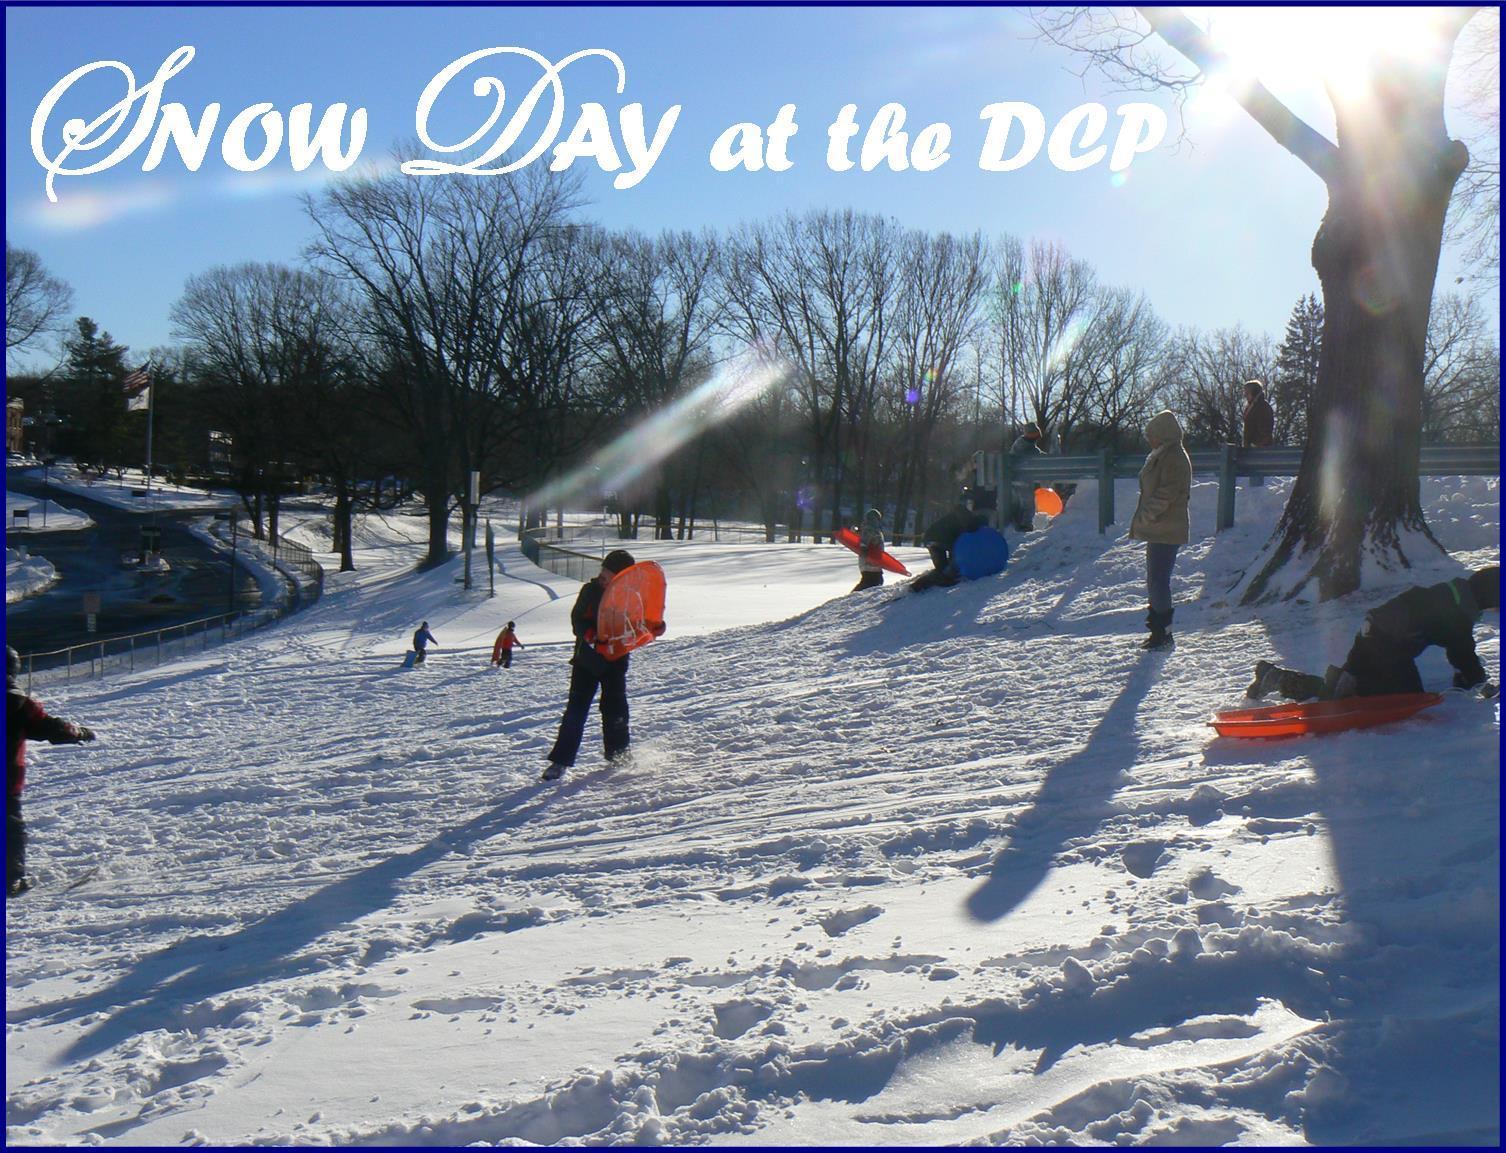 a87f58753b0101a5d1cd_snowday.jpg